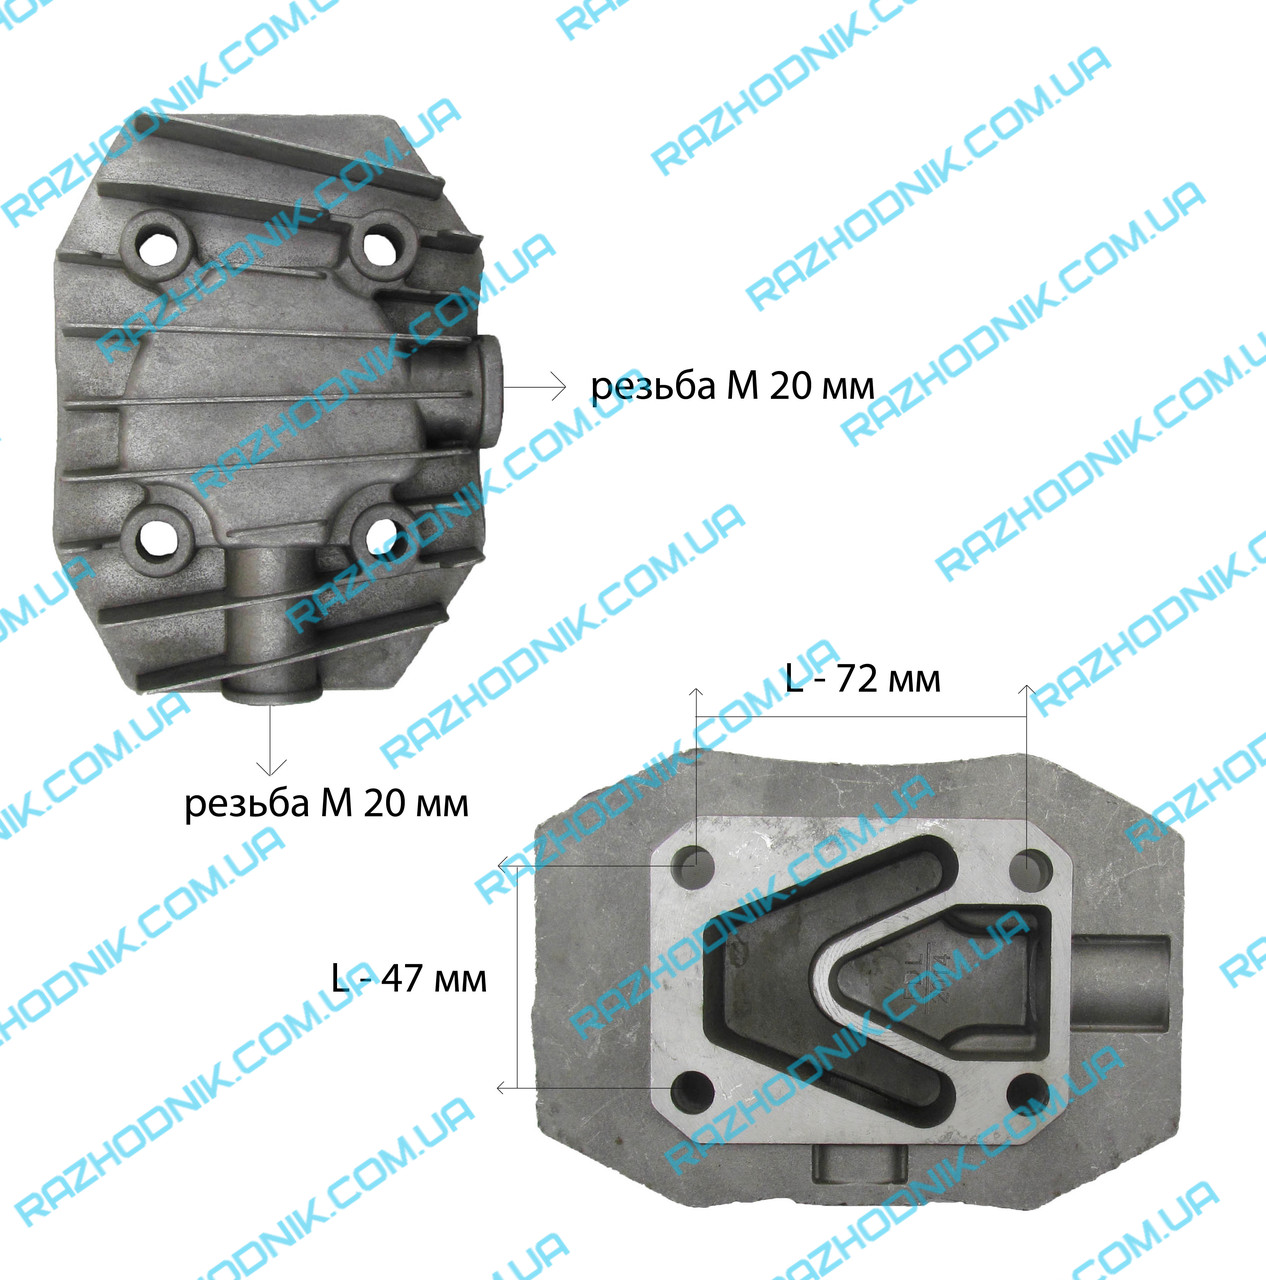 Крышка цилиндра для компрессора 2 тип